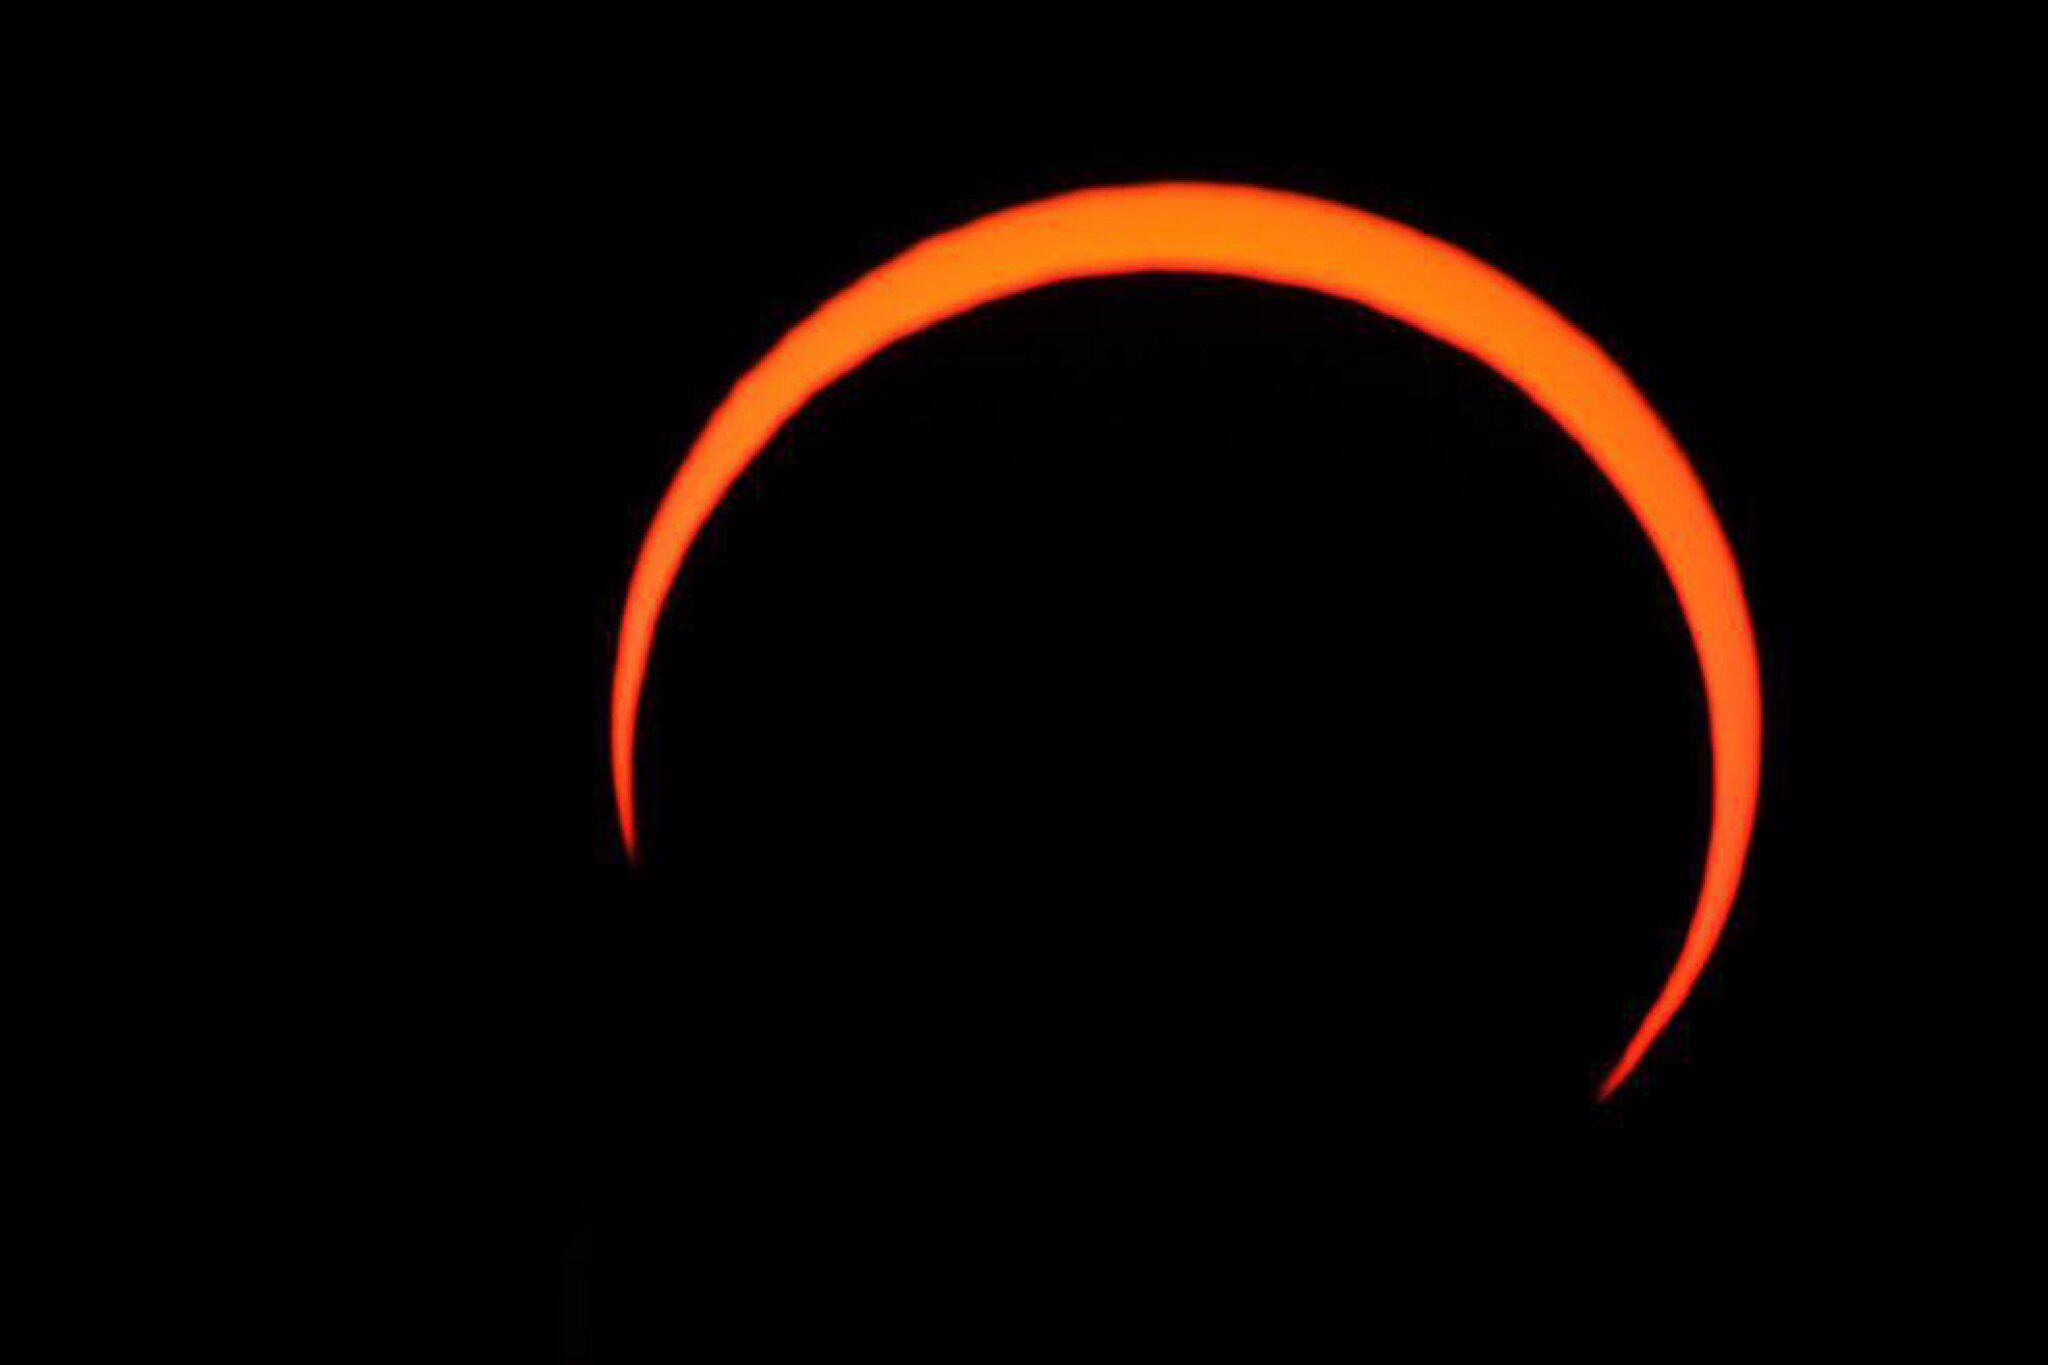 Bild zu Sonnenfinsternis in Saudi-Arabien